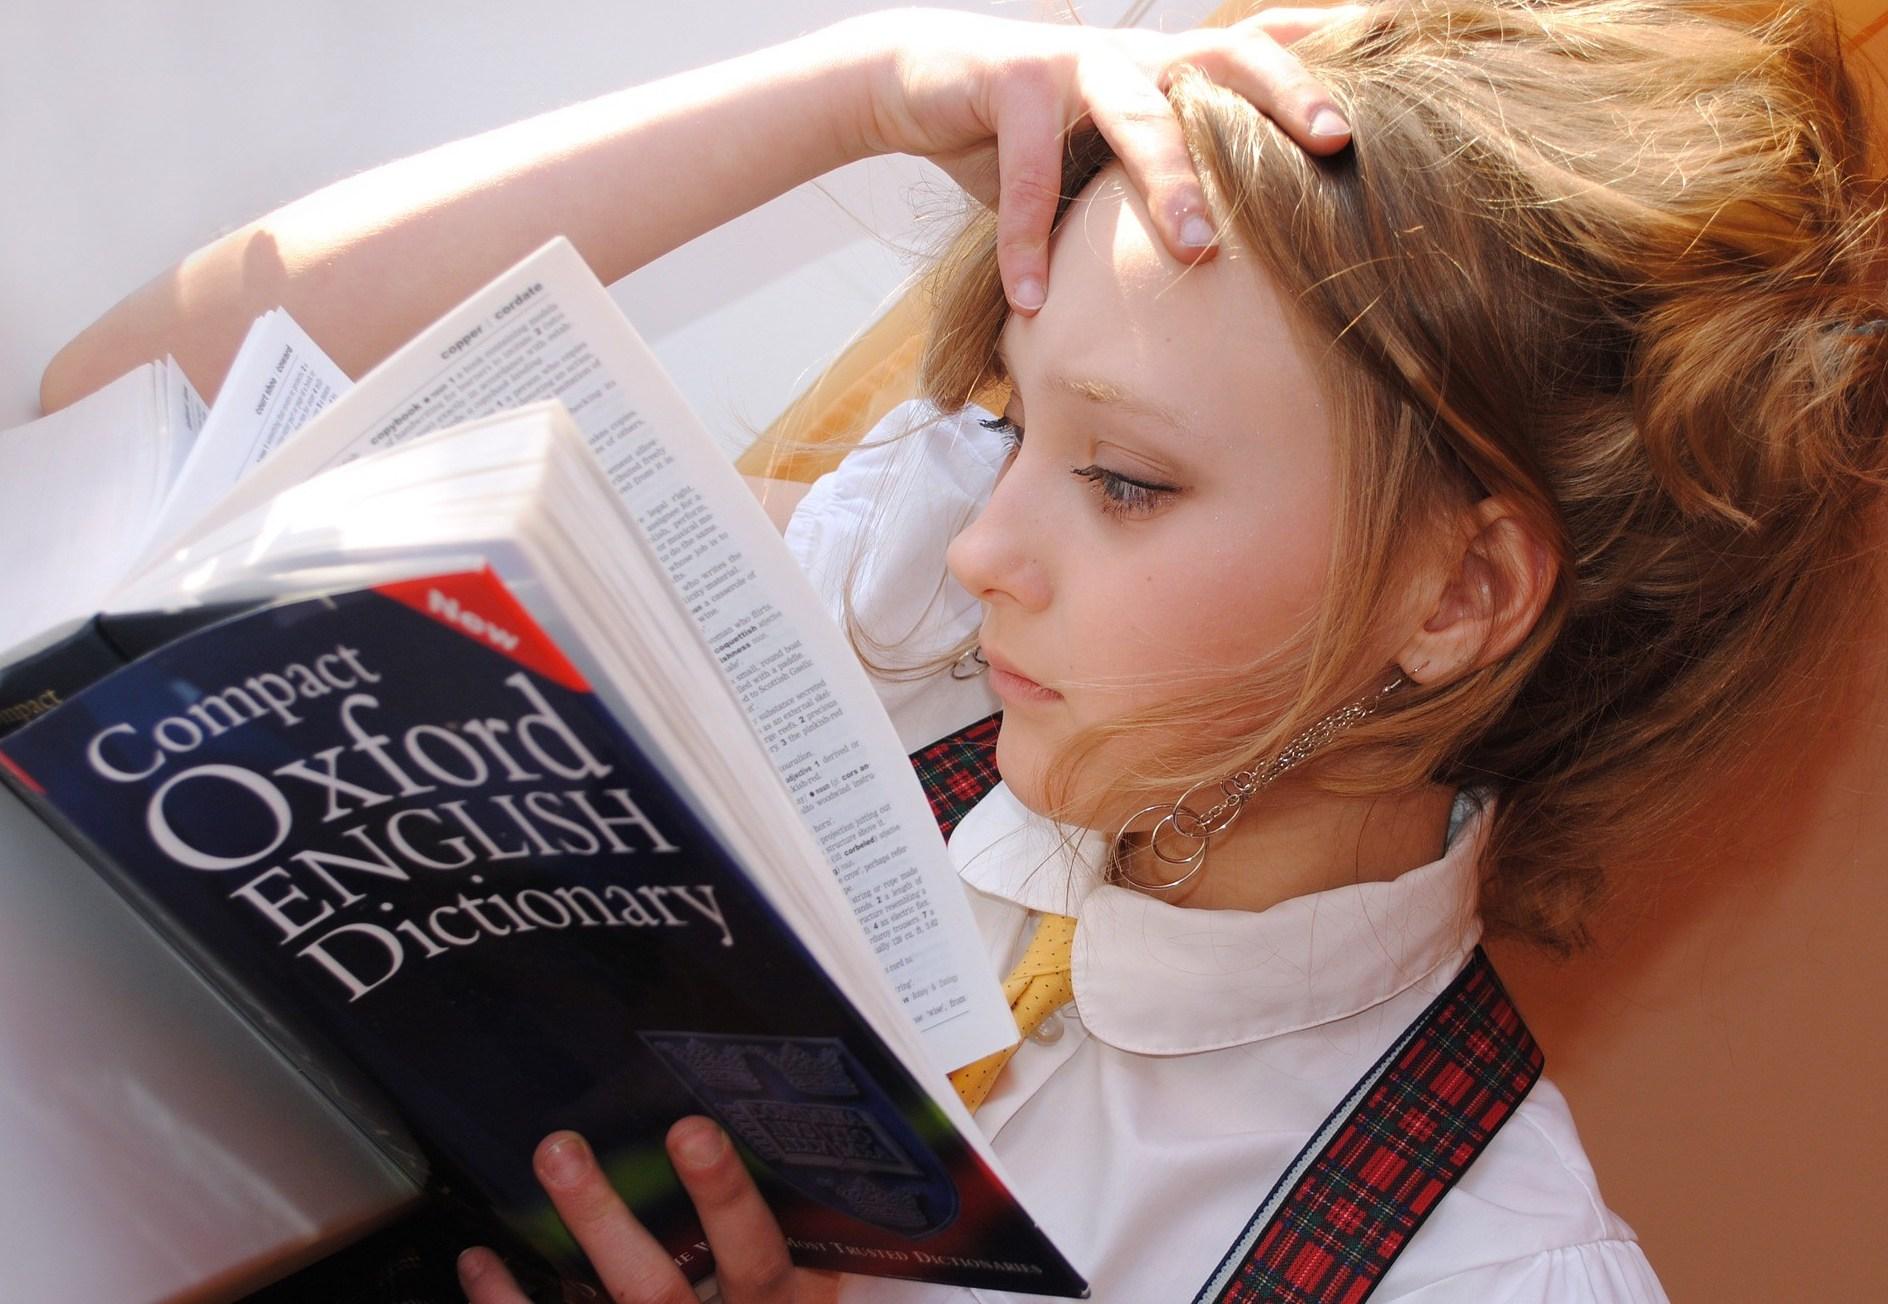 Girl-with-dictionary-Libellule789-via-Pixabay-com.jpg